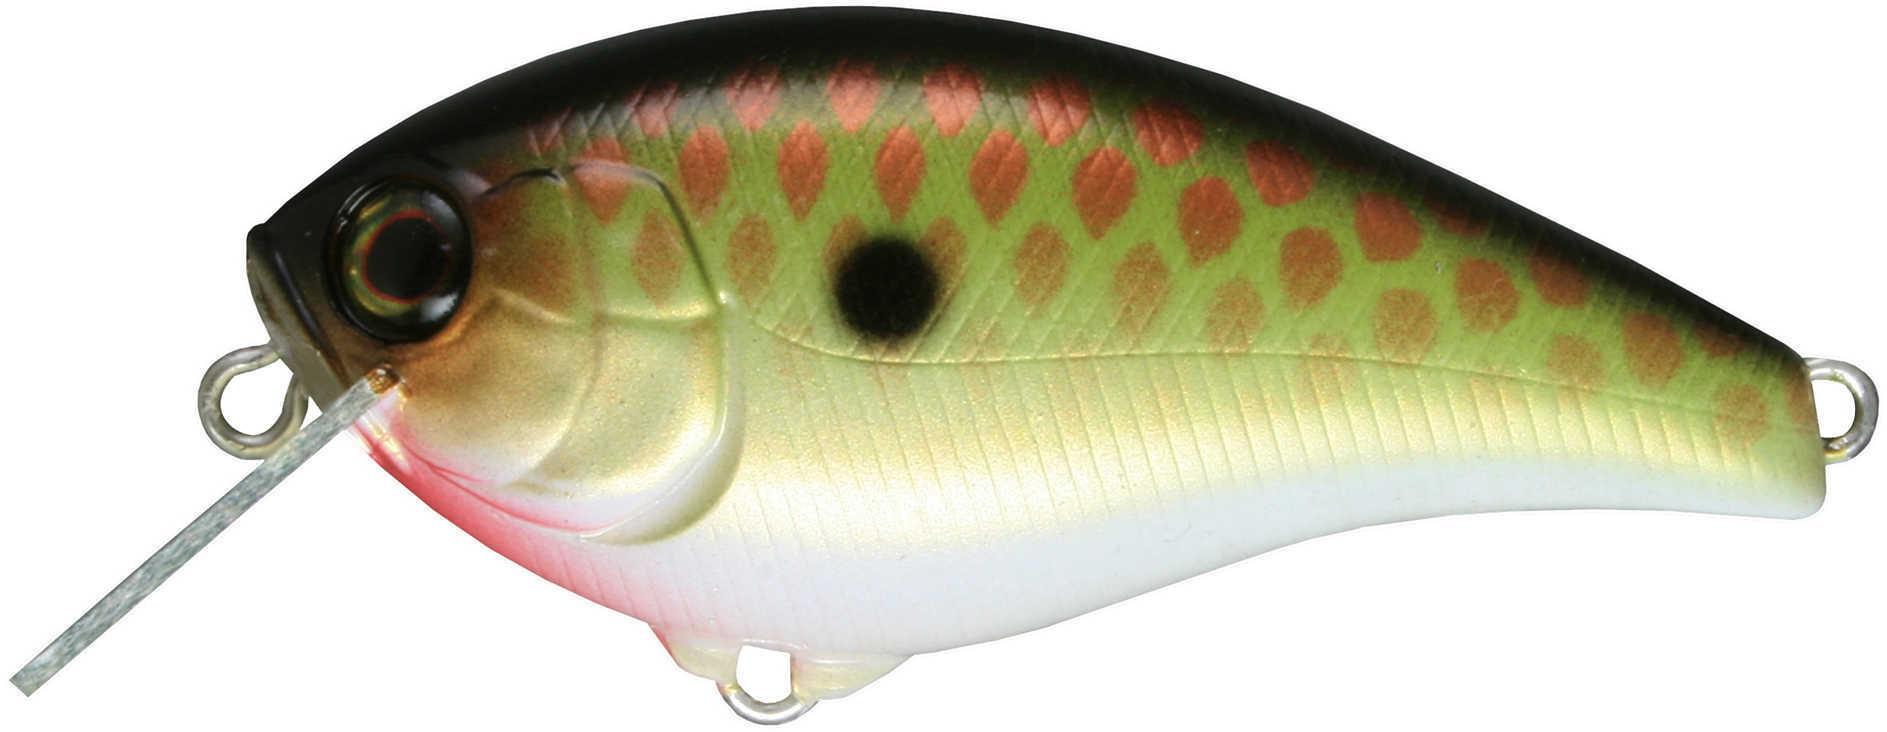 "Jackall Lures Aska60 SR Hard Crank Bait Lure 2 1/2"" Body Length, 4' Depth, 3/8 oz, Bronze Green Shad, Per 1 Md: JASK60SR"